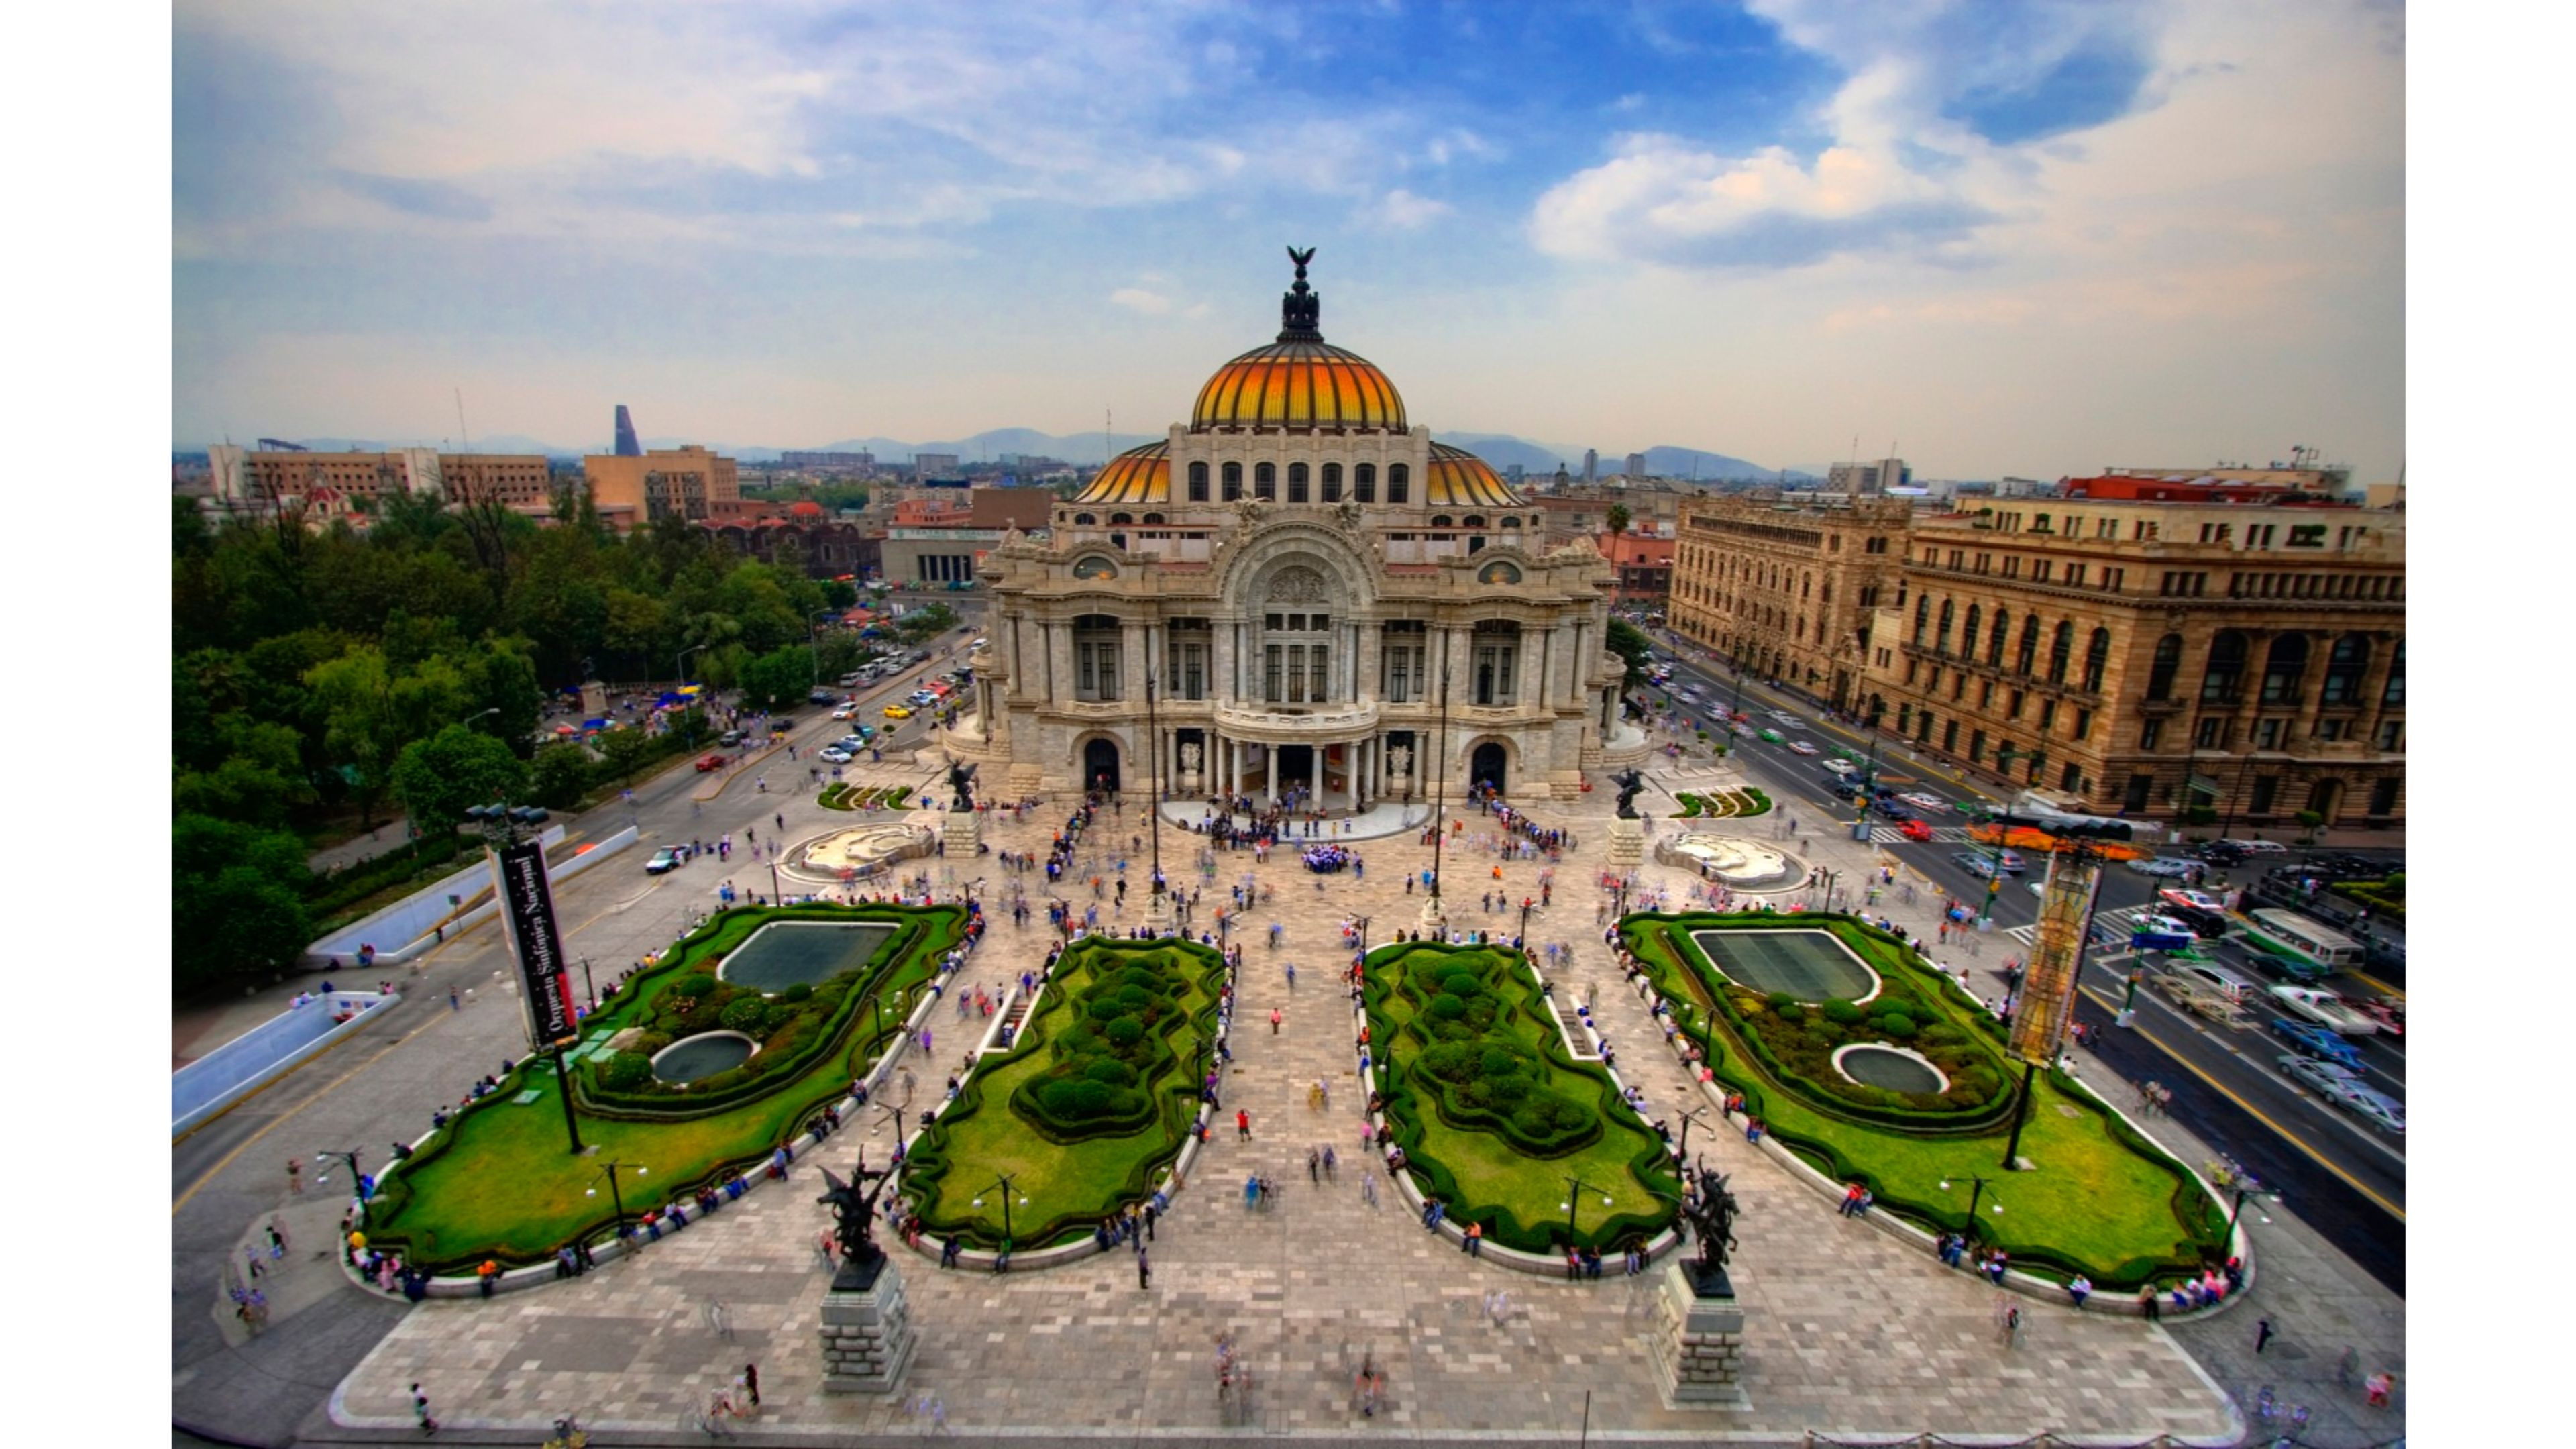 Mexico City Wallpapers 2AR1Z5R 3840x2160 px WallpapersExpertcom 3840x2160